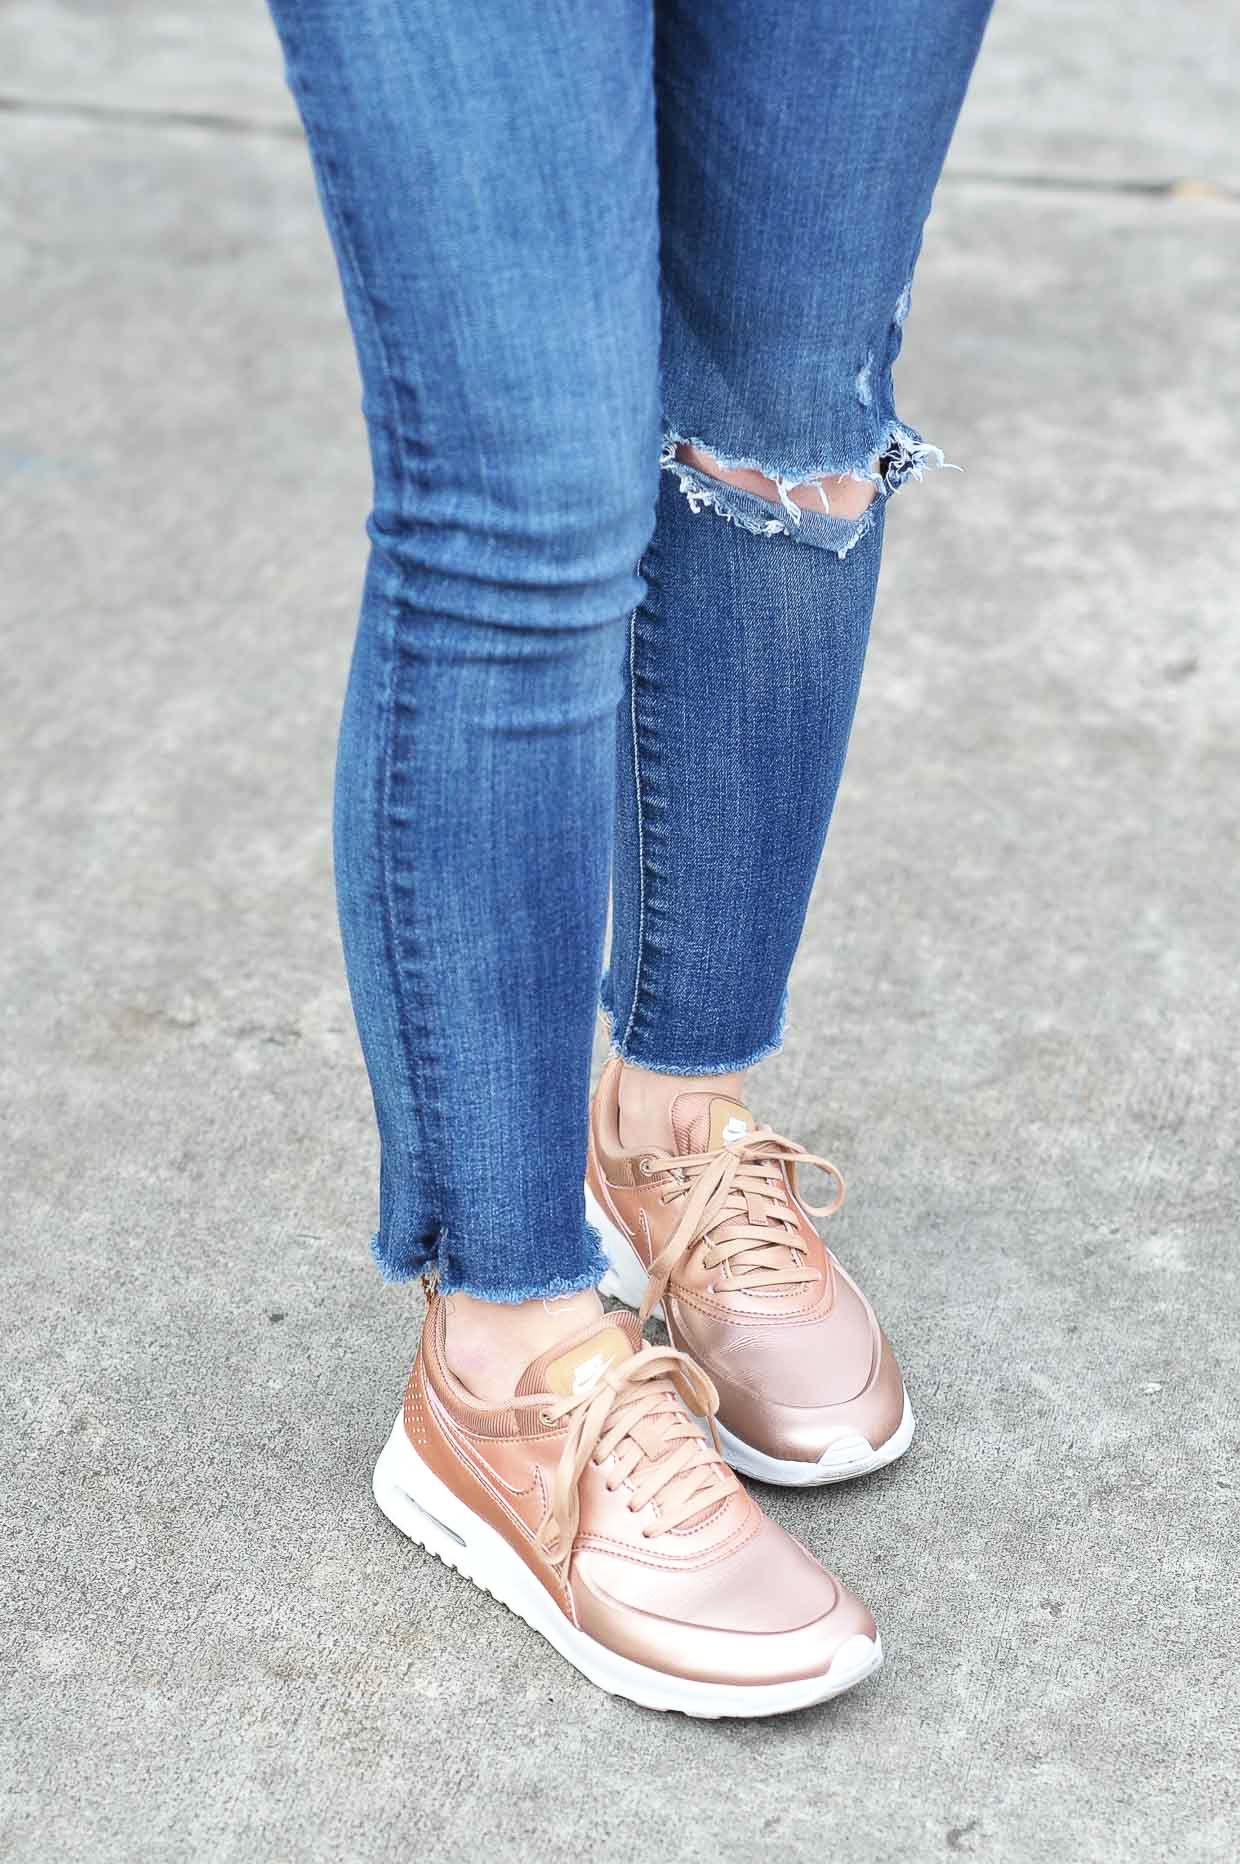 9c9c331b2481 Nike Metallic Air Max Thea Rose Gold Sneakers - Poor Little It Girl